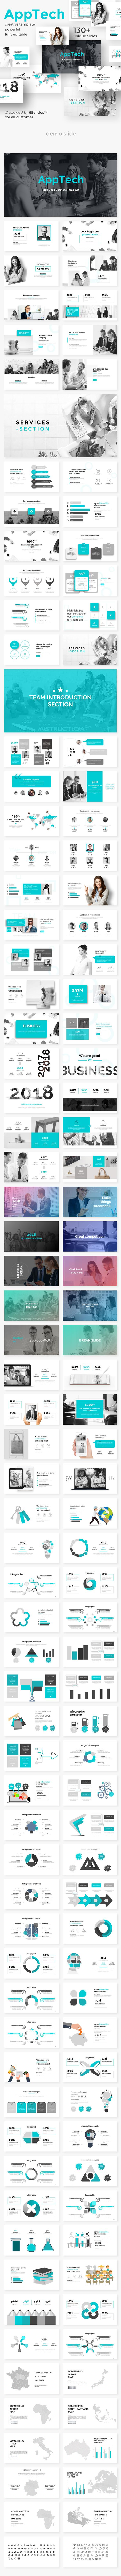 AppTech Pitch Deck Business Powerpoint Template - Business PowerPoint Templates